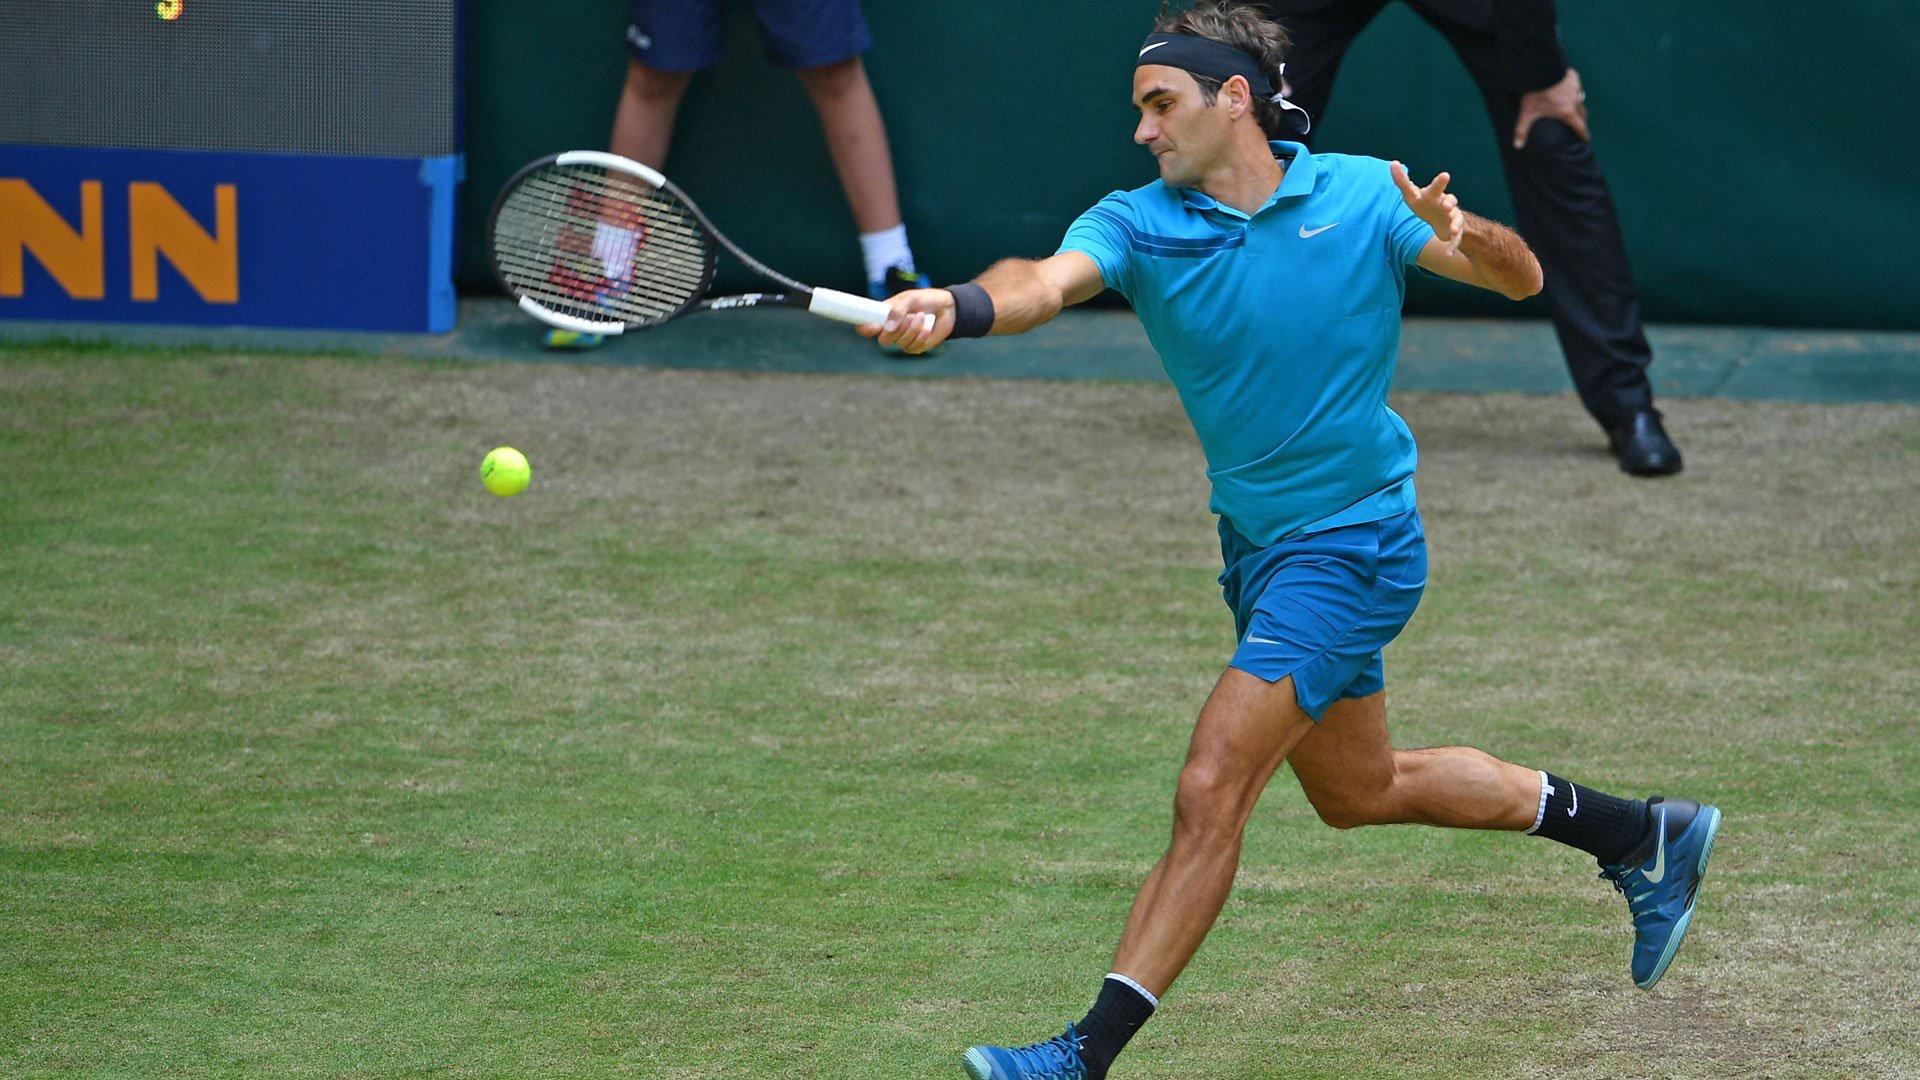 Federer Edges Past Ebden into Gerry Weber Open Semifinals